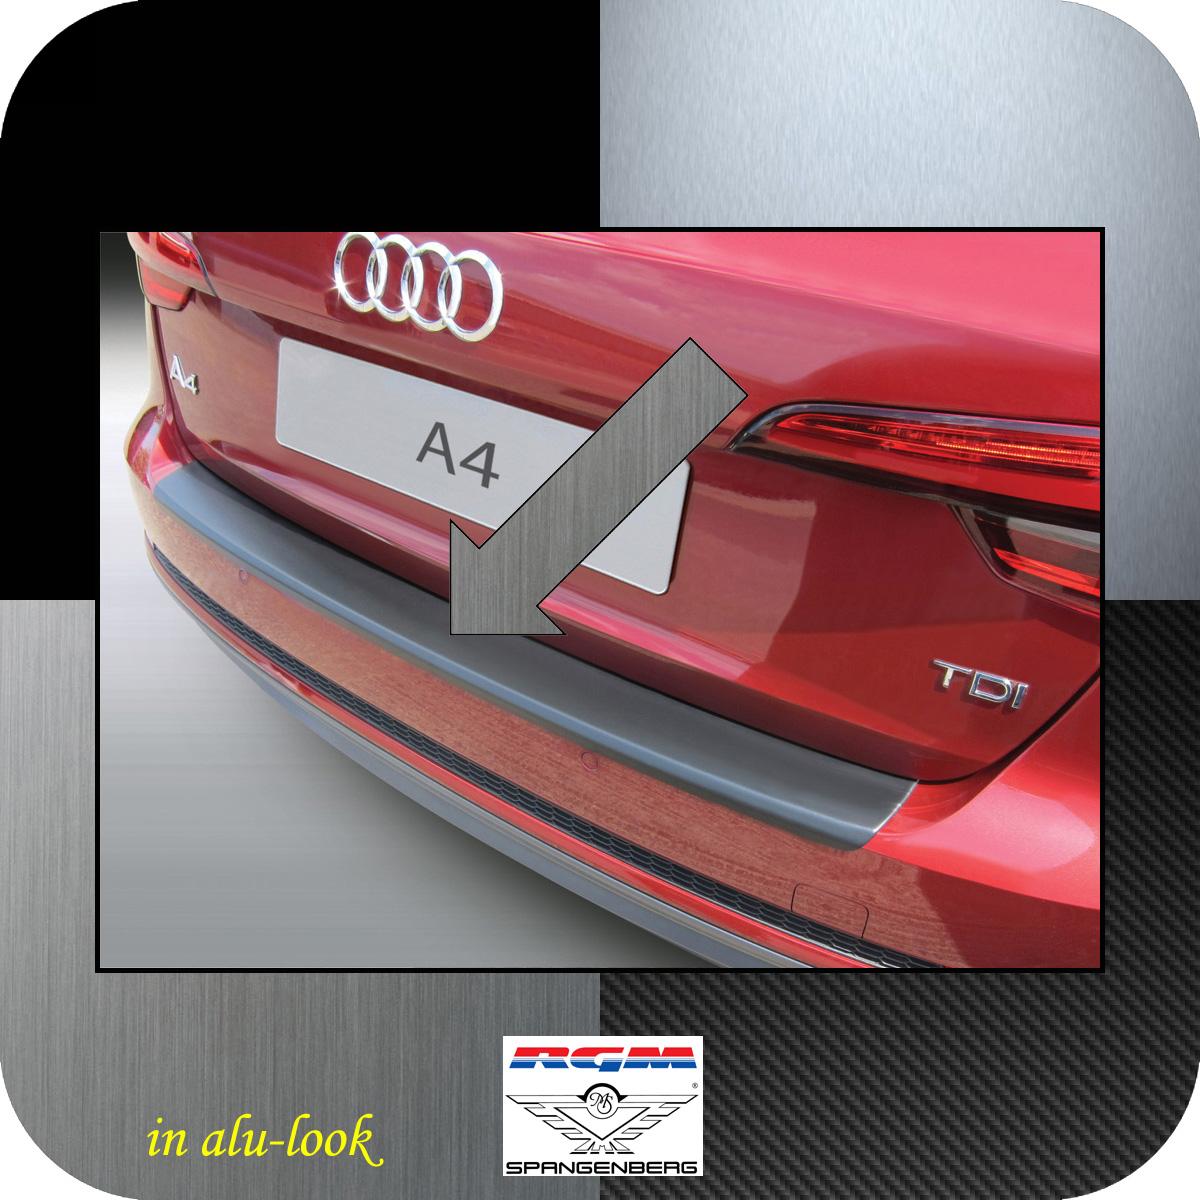 Ladekantenschutz Alu-Look Audi A4 B9 Avant auch S-Line 5-Türer 2015- 3504894